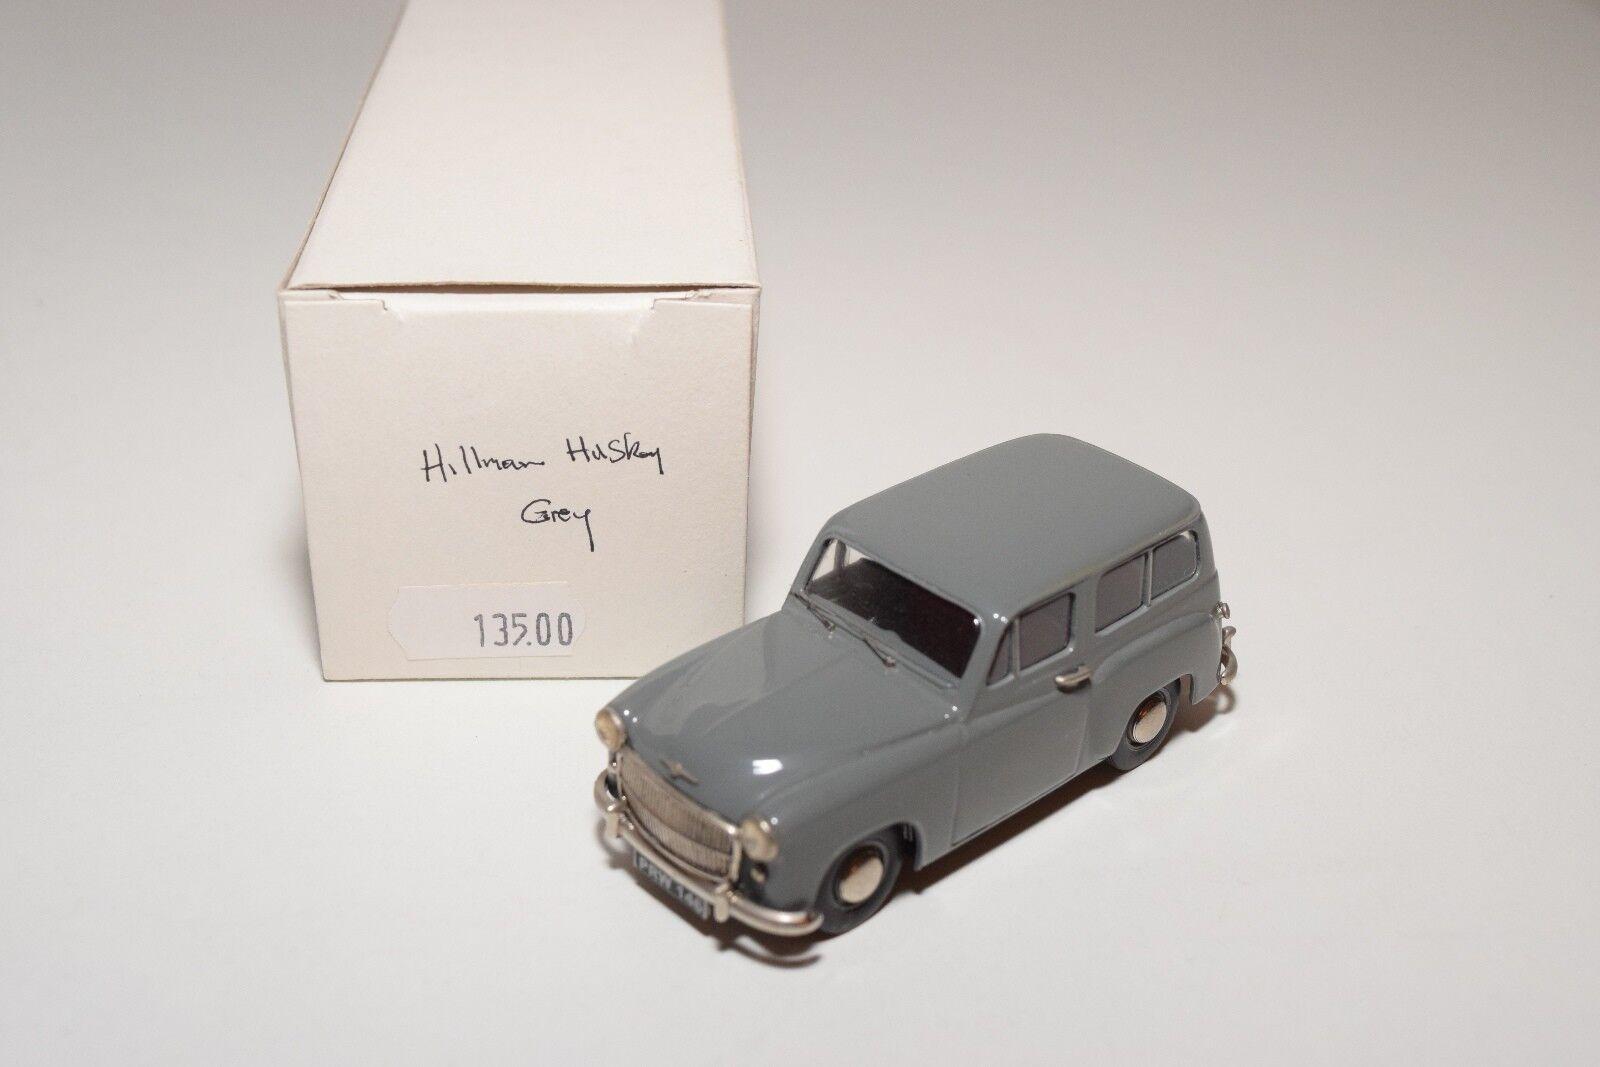 EMMY MODELS MASTERPIECE HILLMAN HUSKY gris MINT BOXED RARE